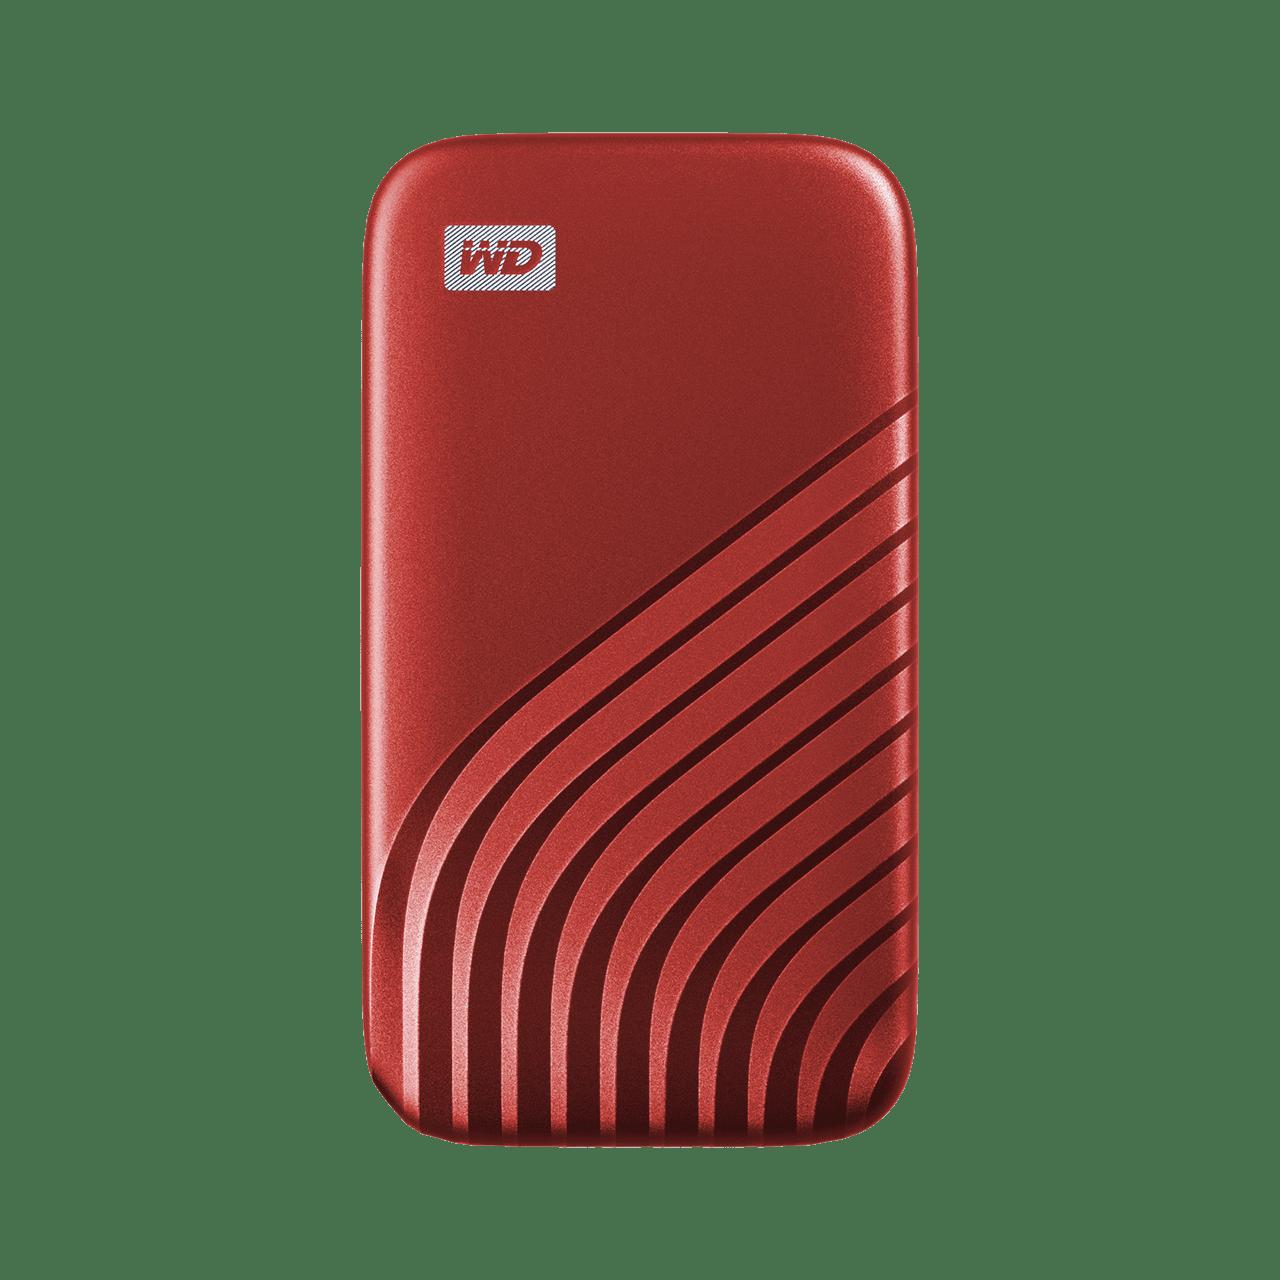 Ext. SSD WD My Passport SSD 2TB červená - WDBAGF0020BRD-WESN